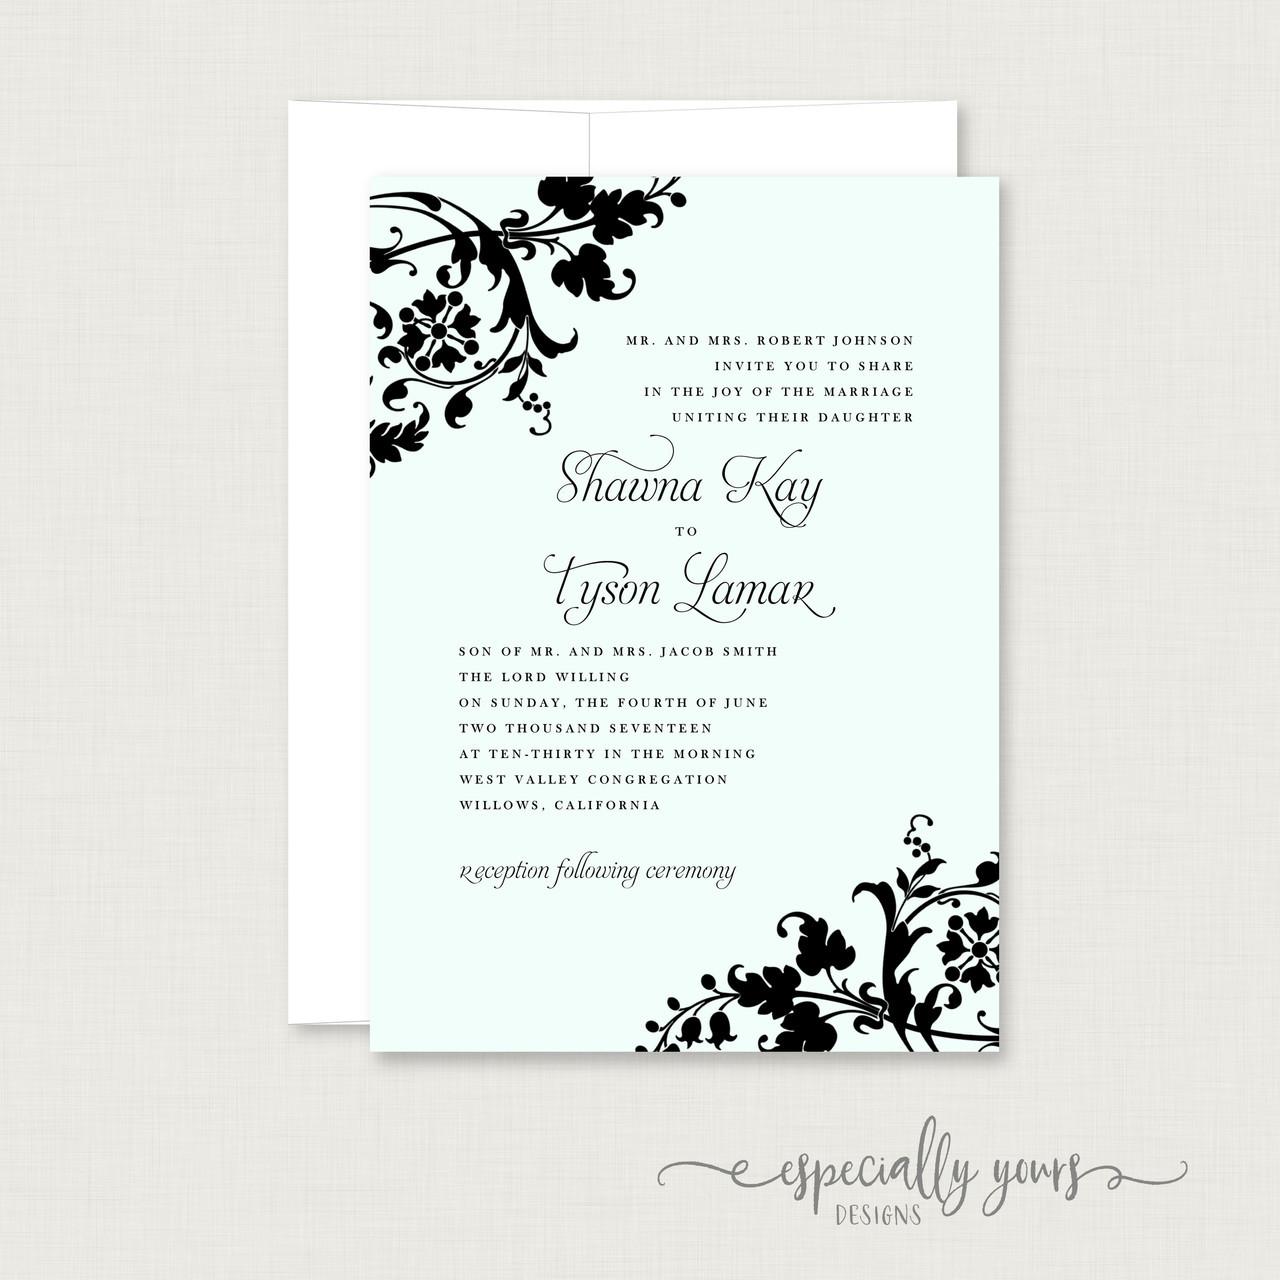 Aqua & Black Flourish Wedding Invitation - Especially Yours Designs